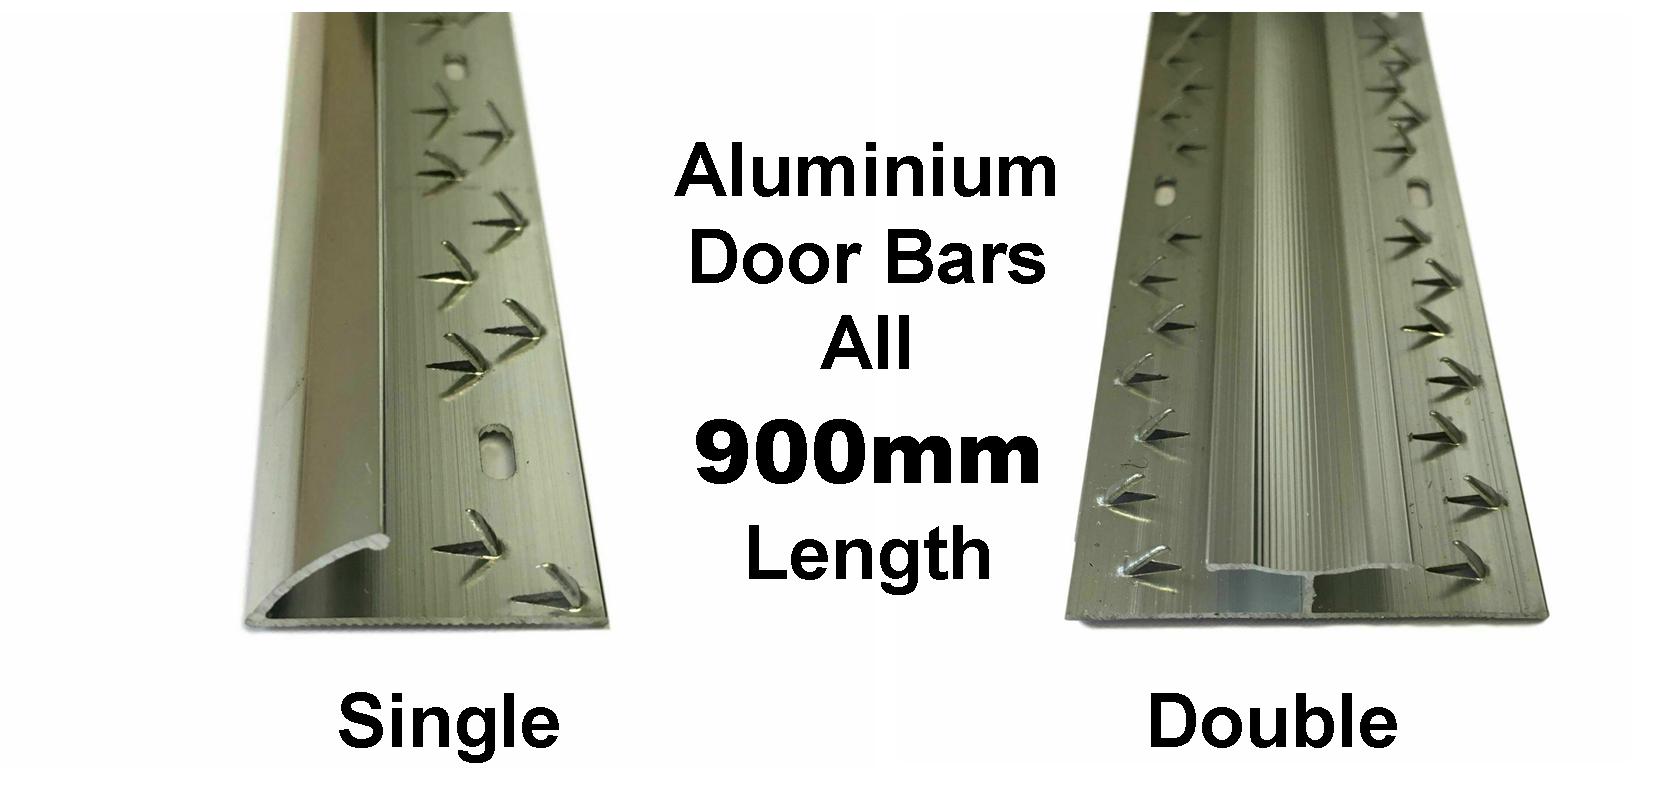 Single and double door bars. 900mm Alu only